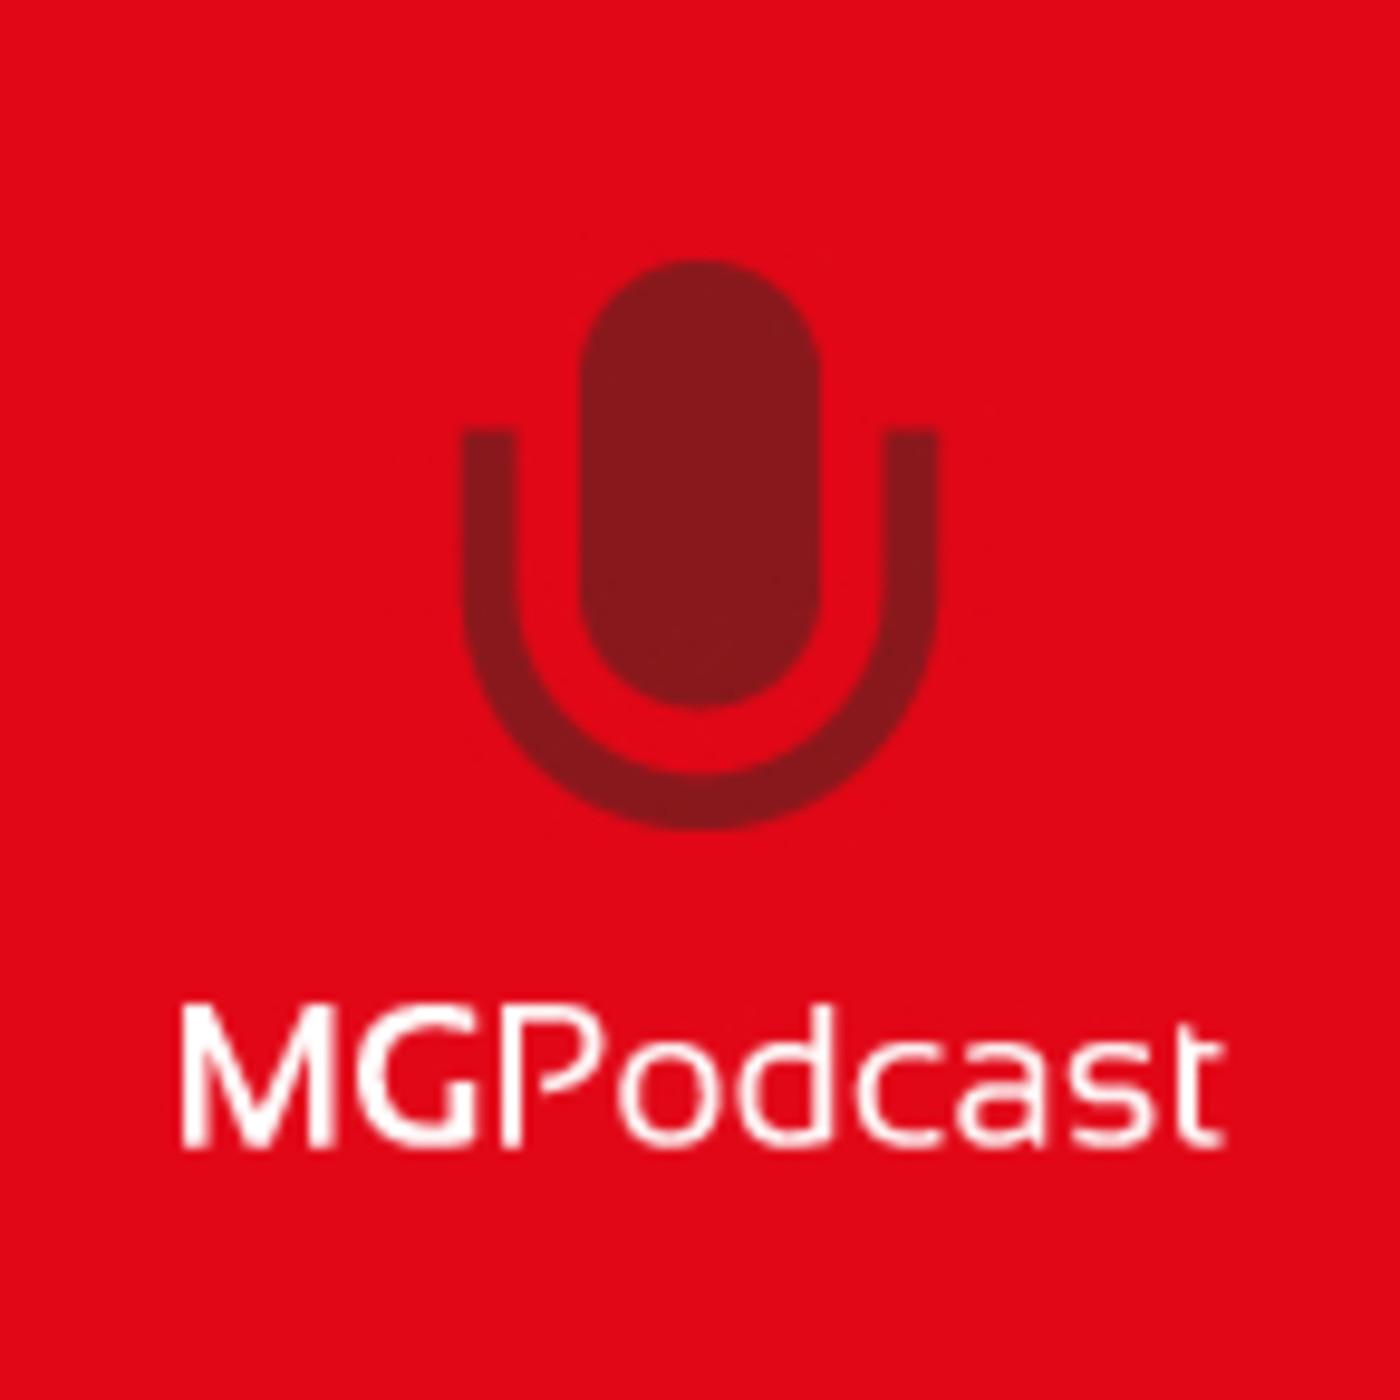 MG Podcast 2x23 - Batman Arkham Origins, Next Gen, cierre Lucas, debate Oriente vs Occidente